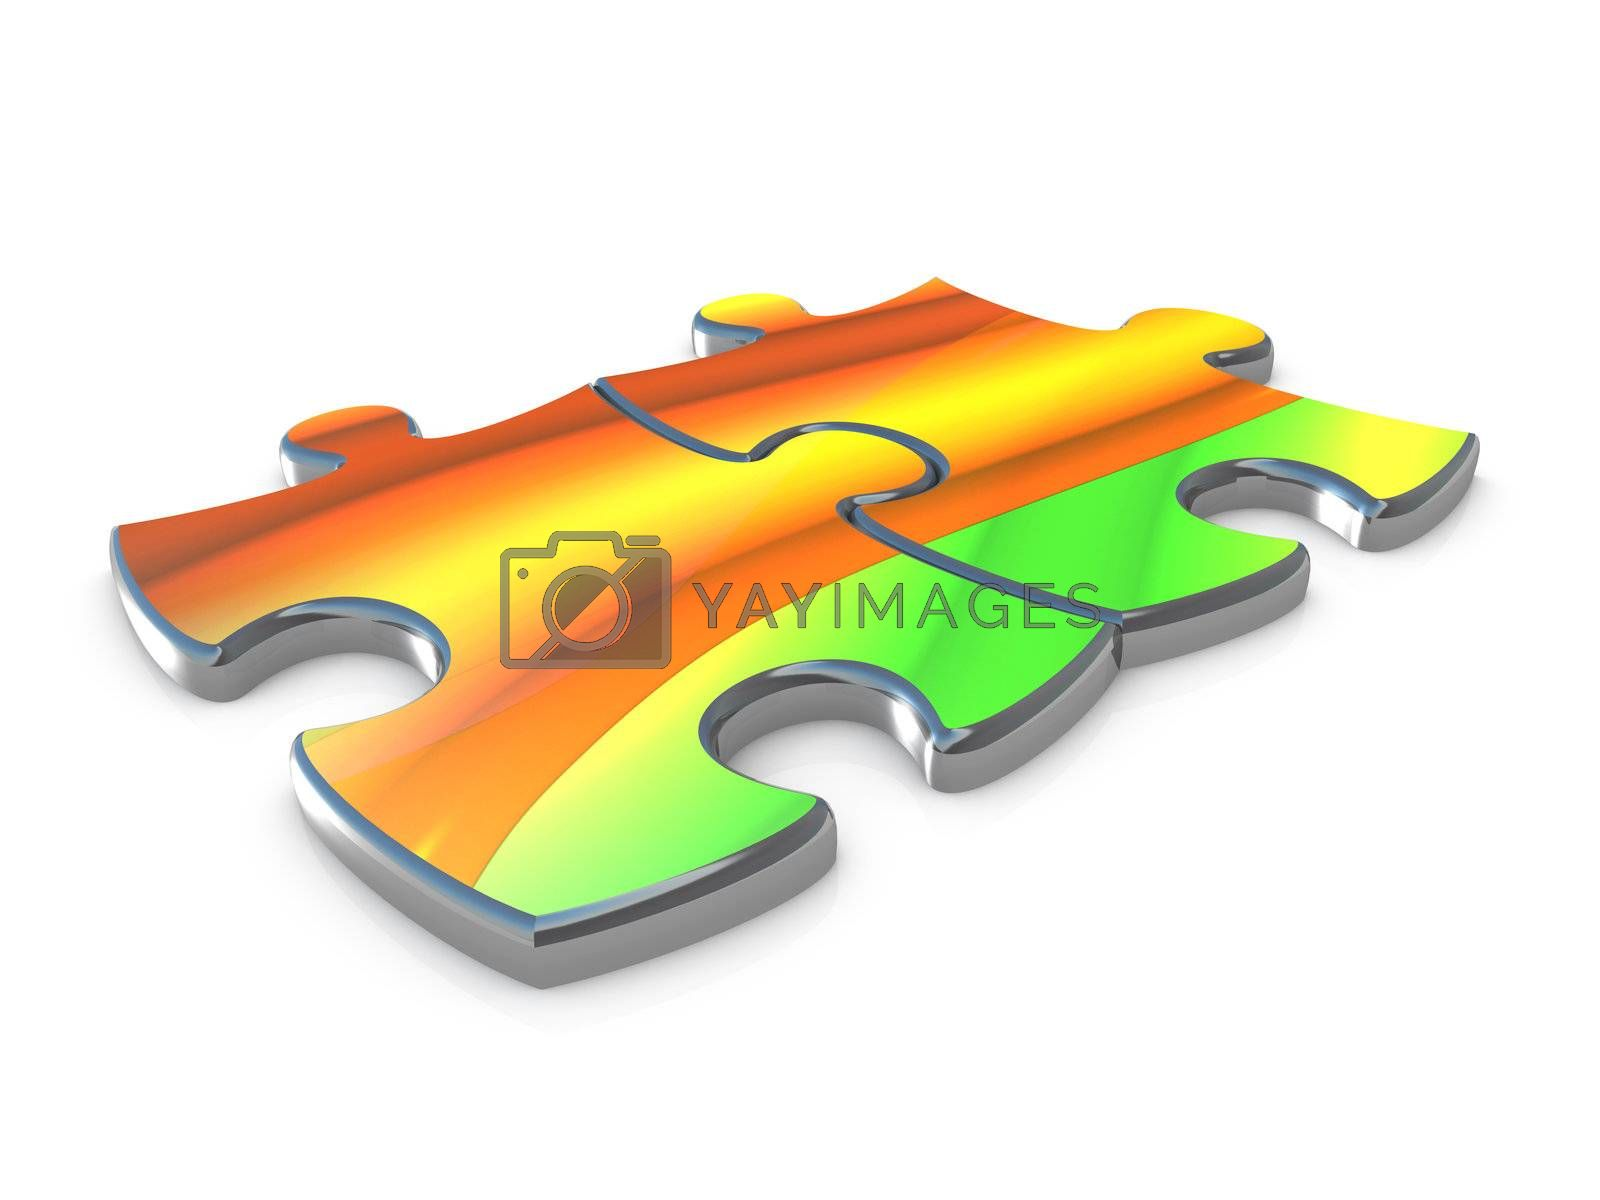 Jigsaw Puzzle by 3pod